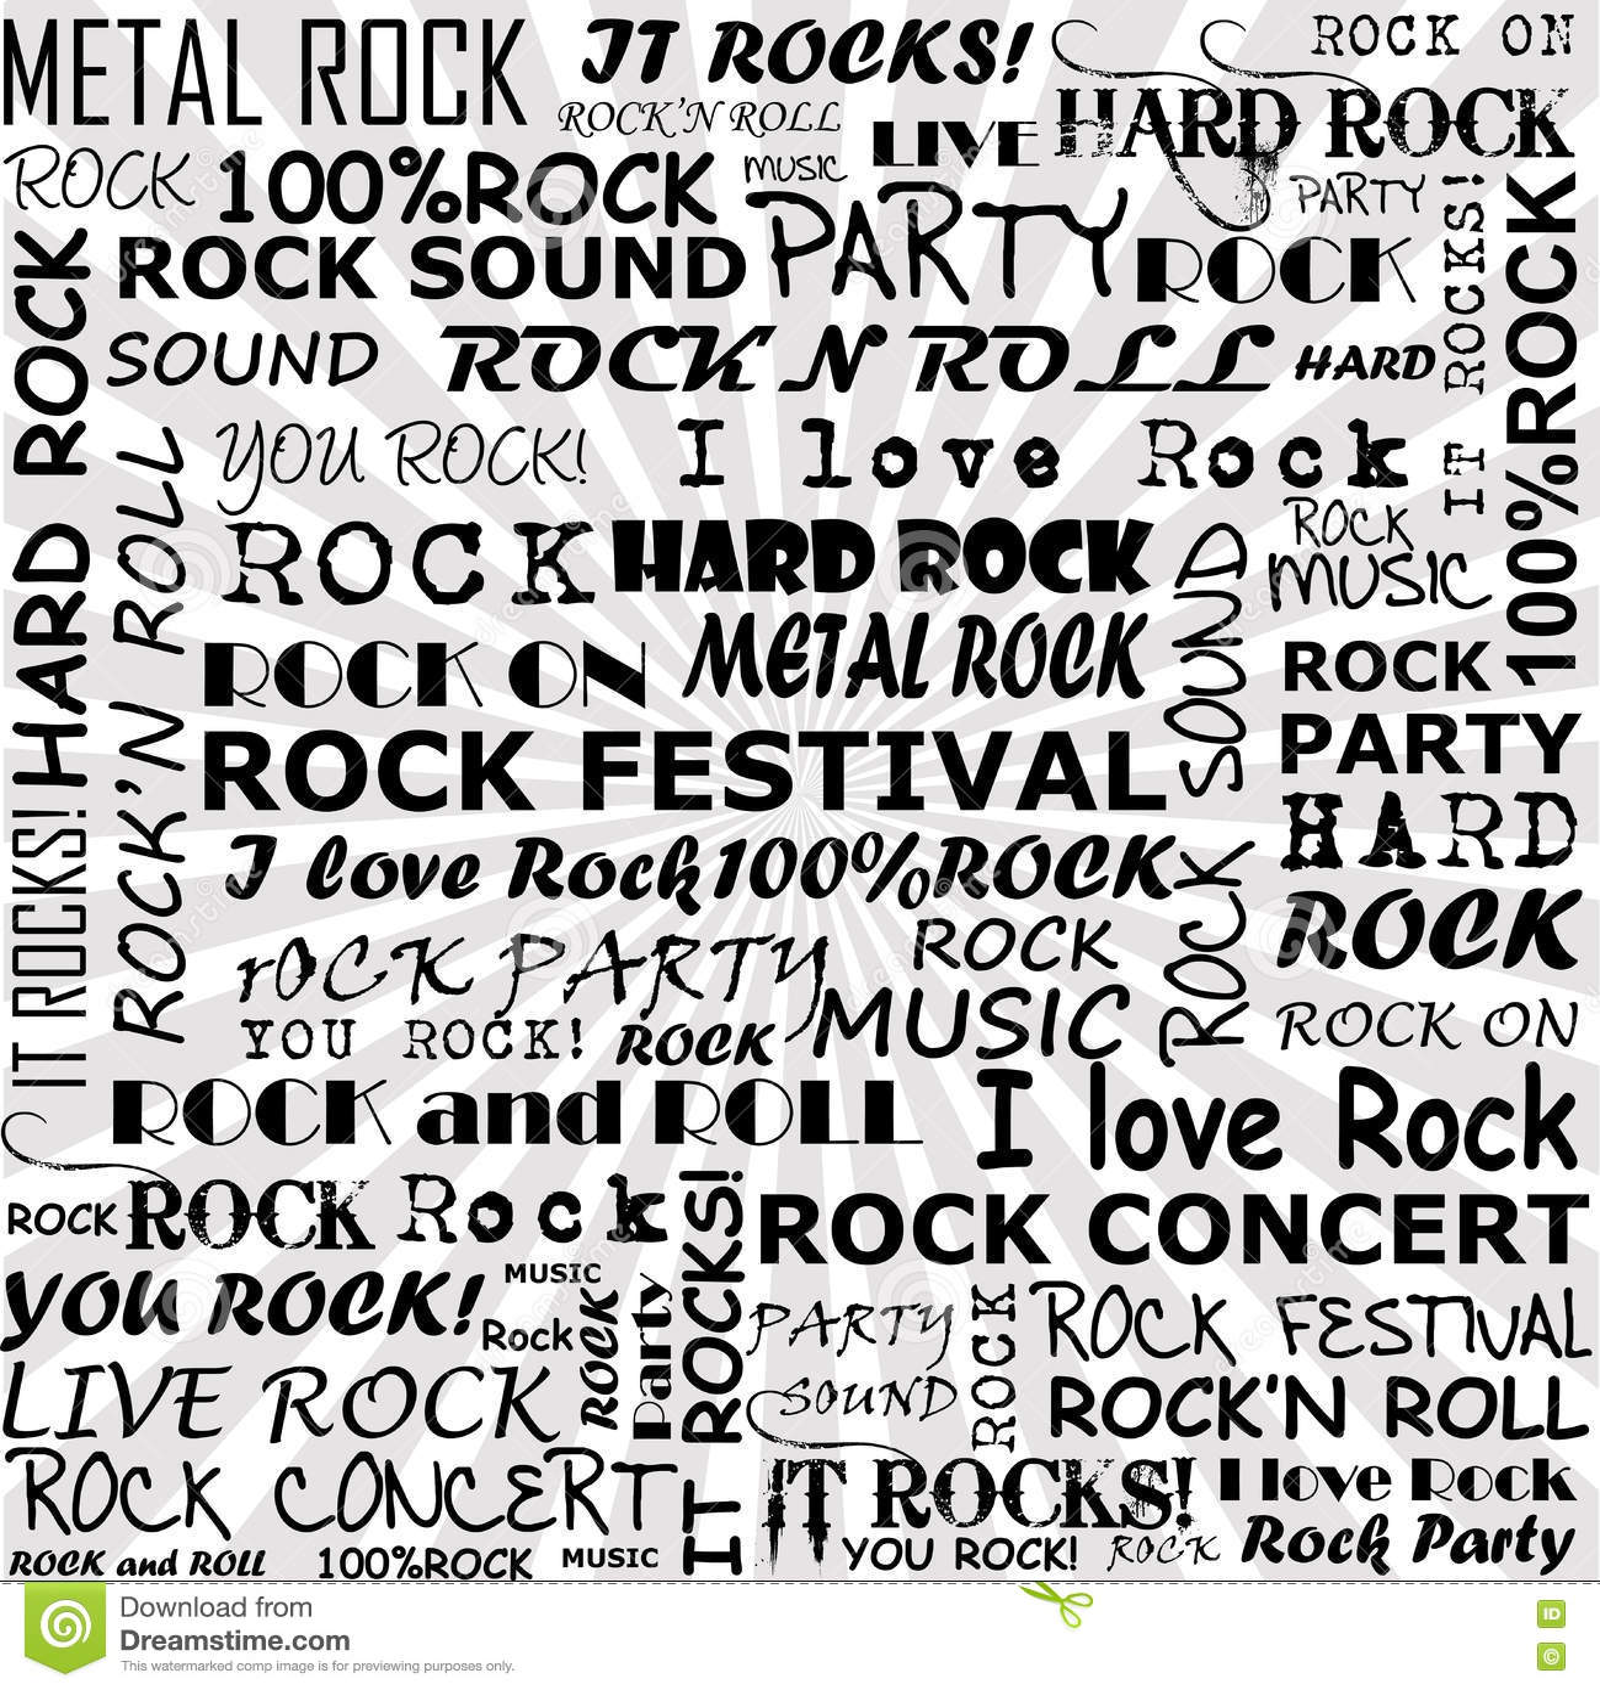 rock n roll terms